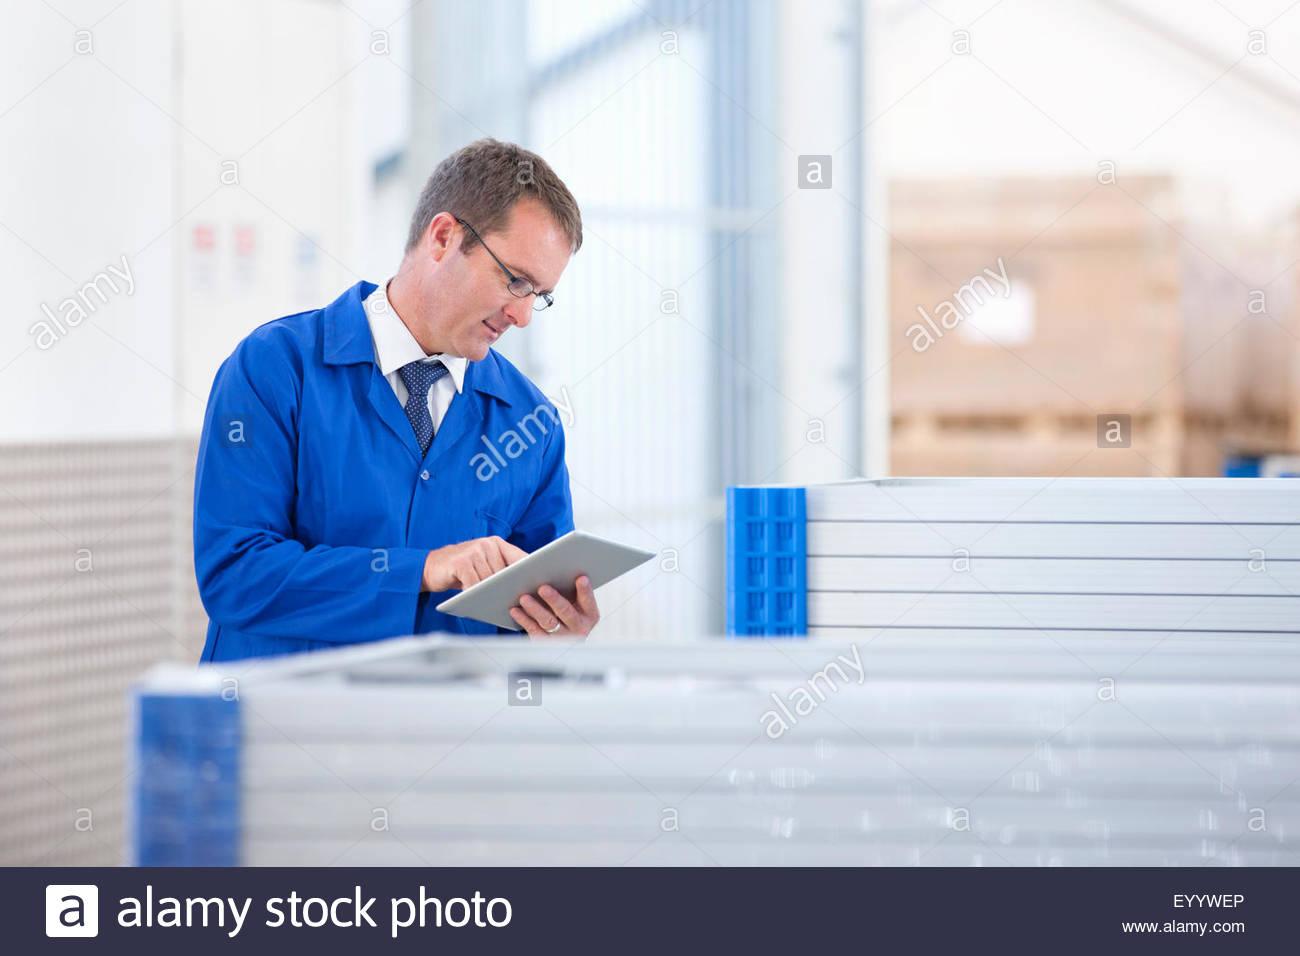 Trabajador supervisor control de stock de paneles solares en fábrica Imagen De Stock